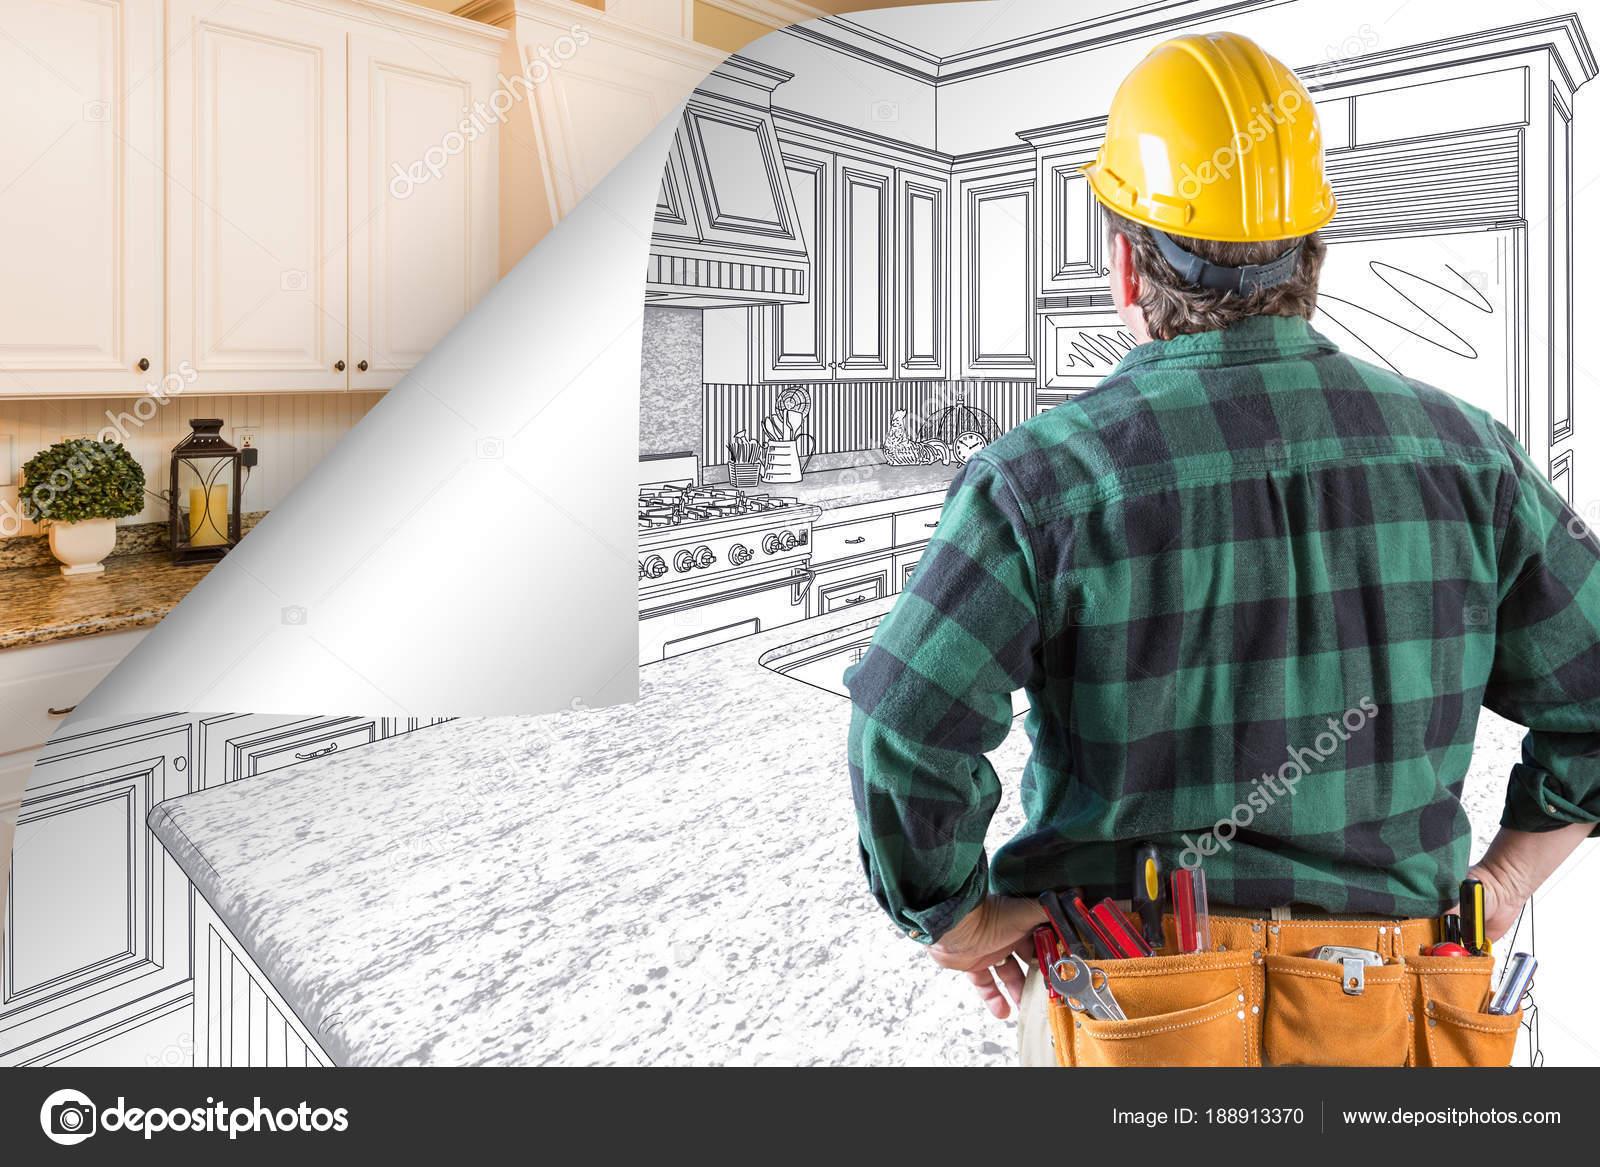 kitchen contractor transformations 承包商面对厨房图纸与页角翻转到完成照片背后 图库照片 c feverpitch 图库